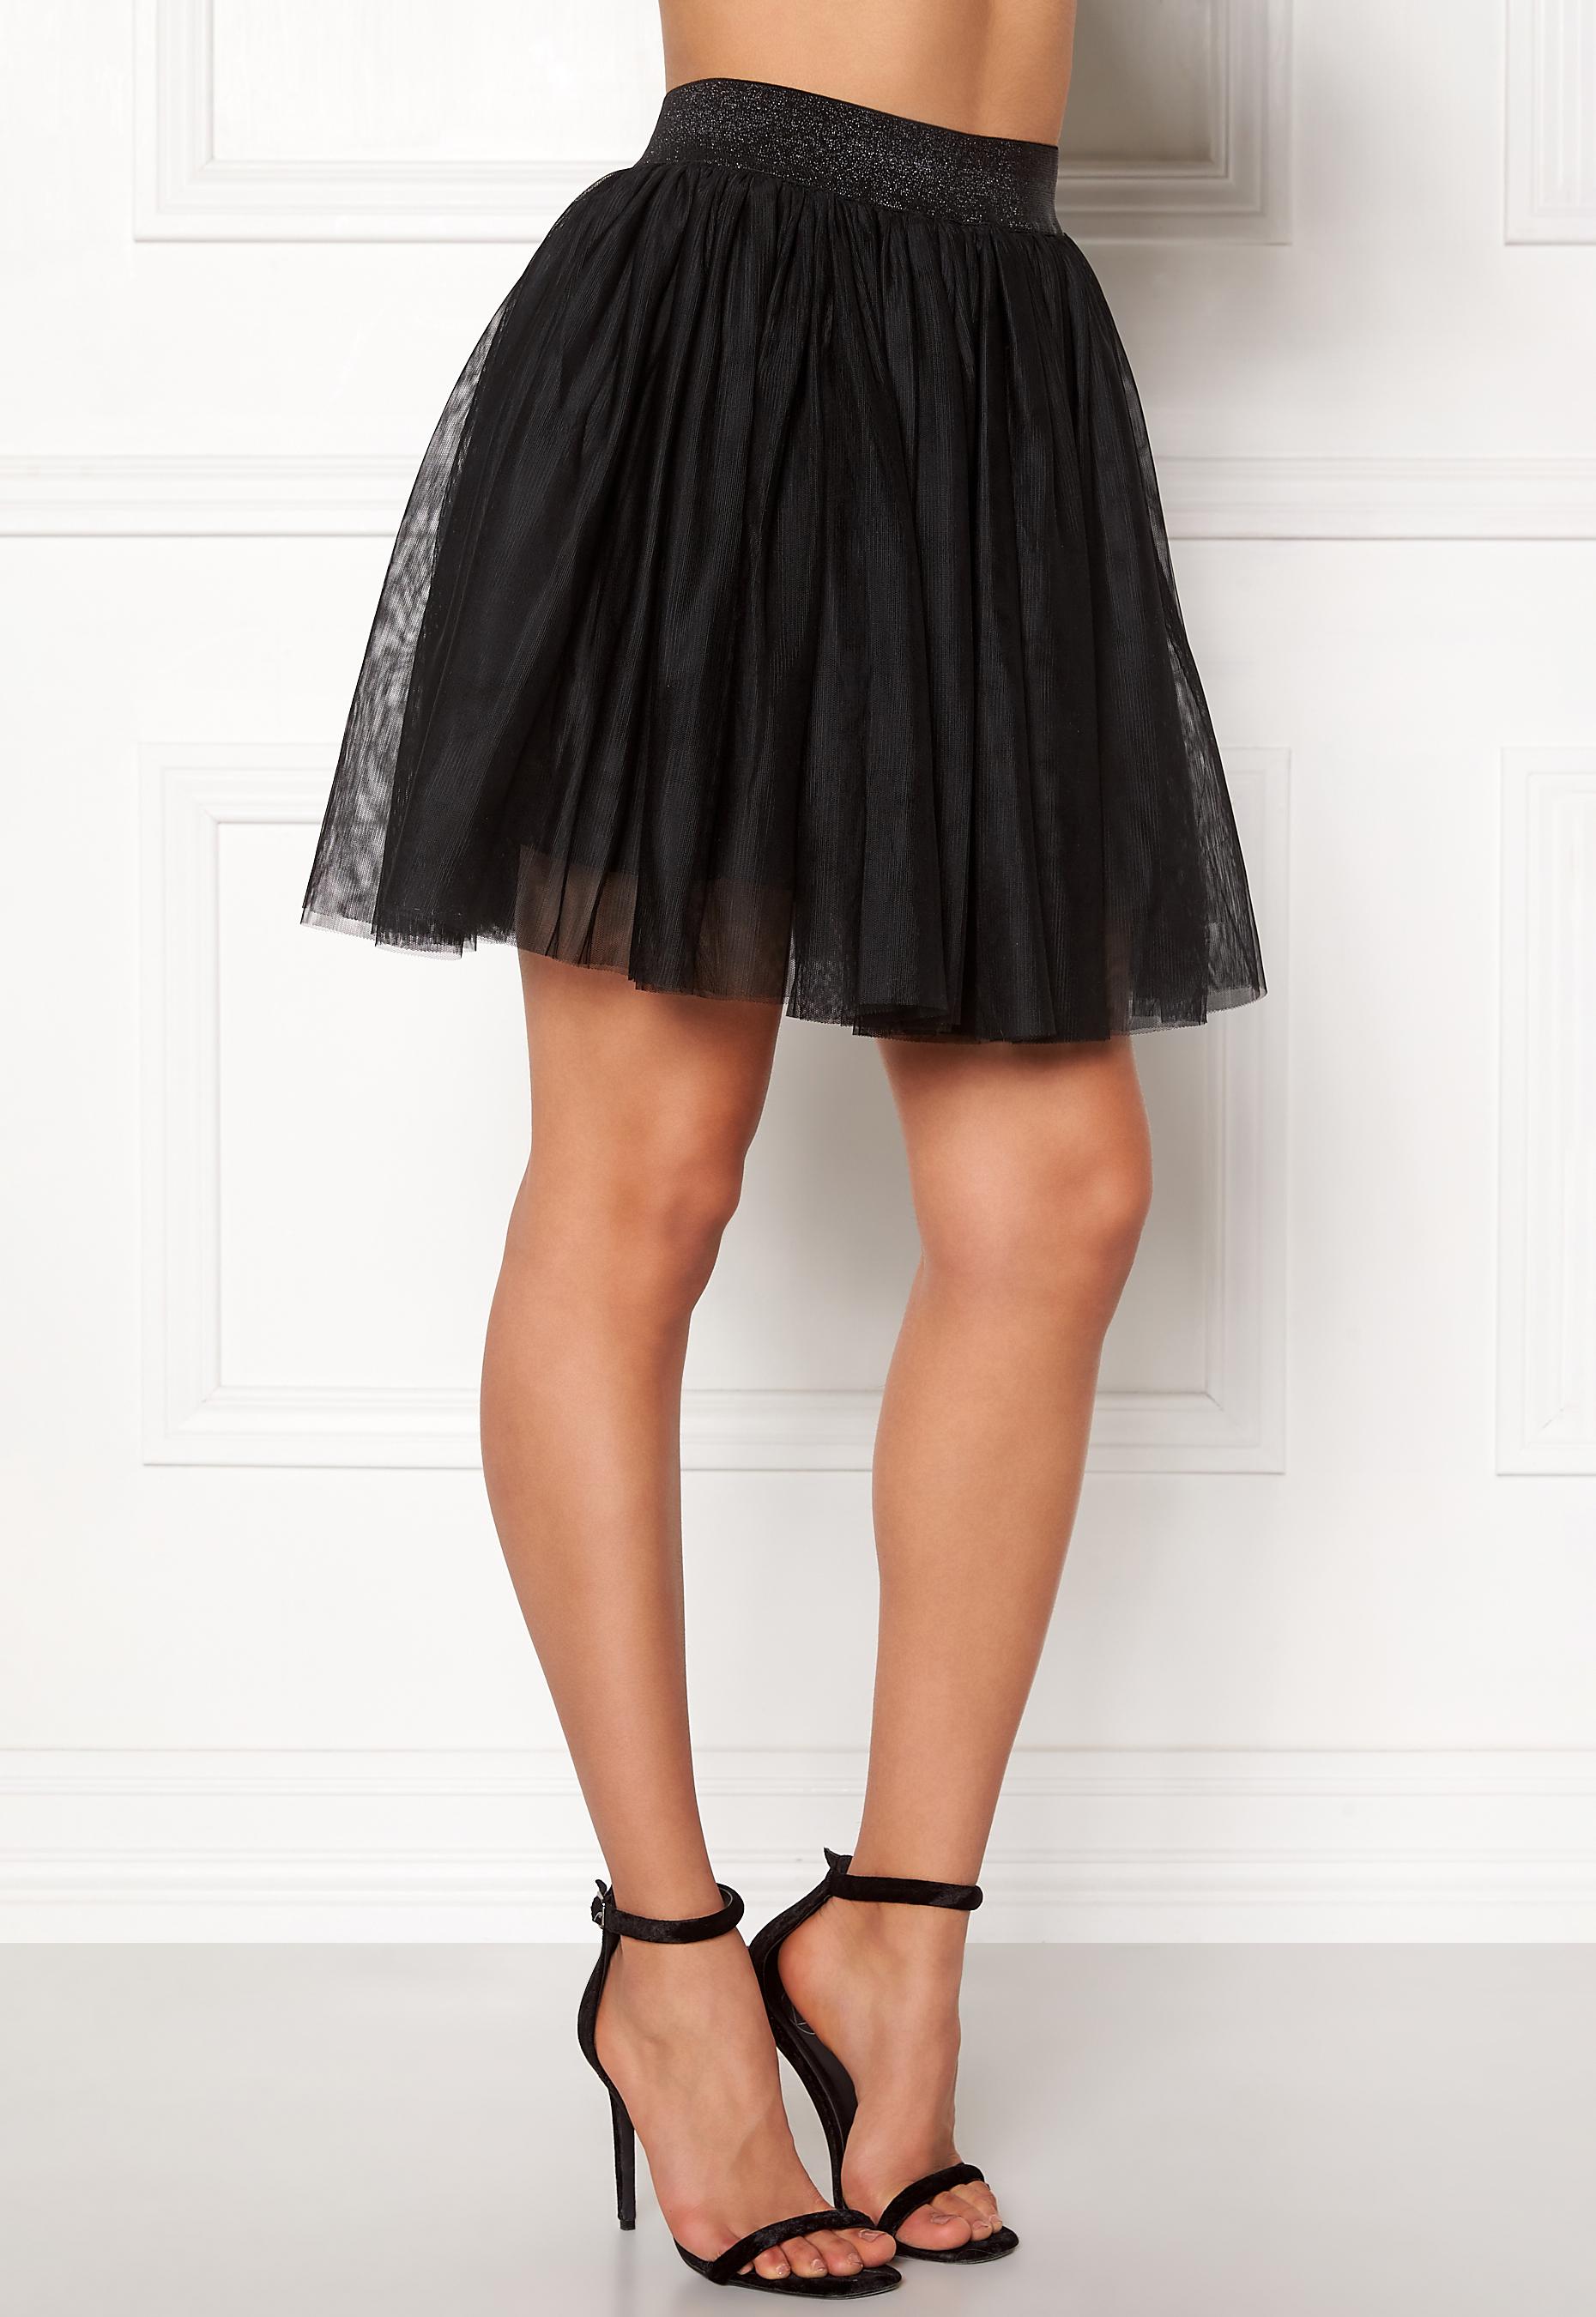 97f5a10e96 VERO MODA Tulle Short Skirt Black - Bubbleroom